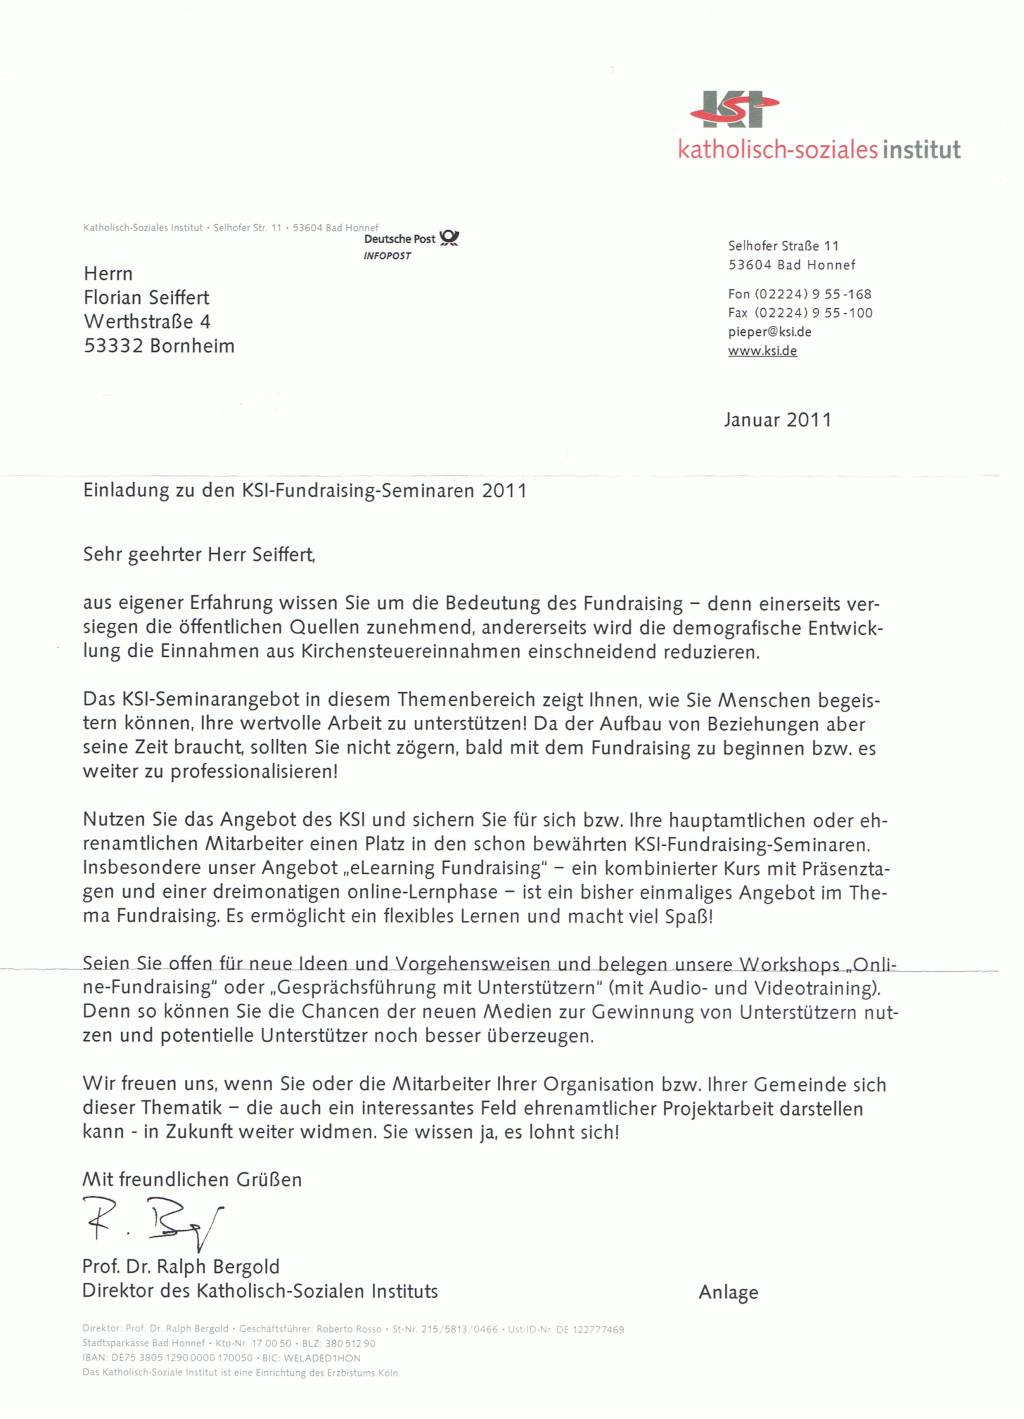 Einladung KSI-Fundraising 2011